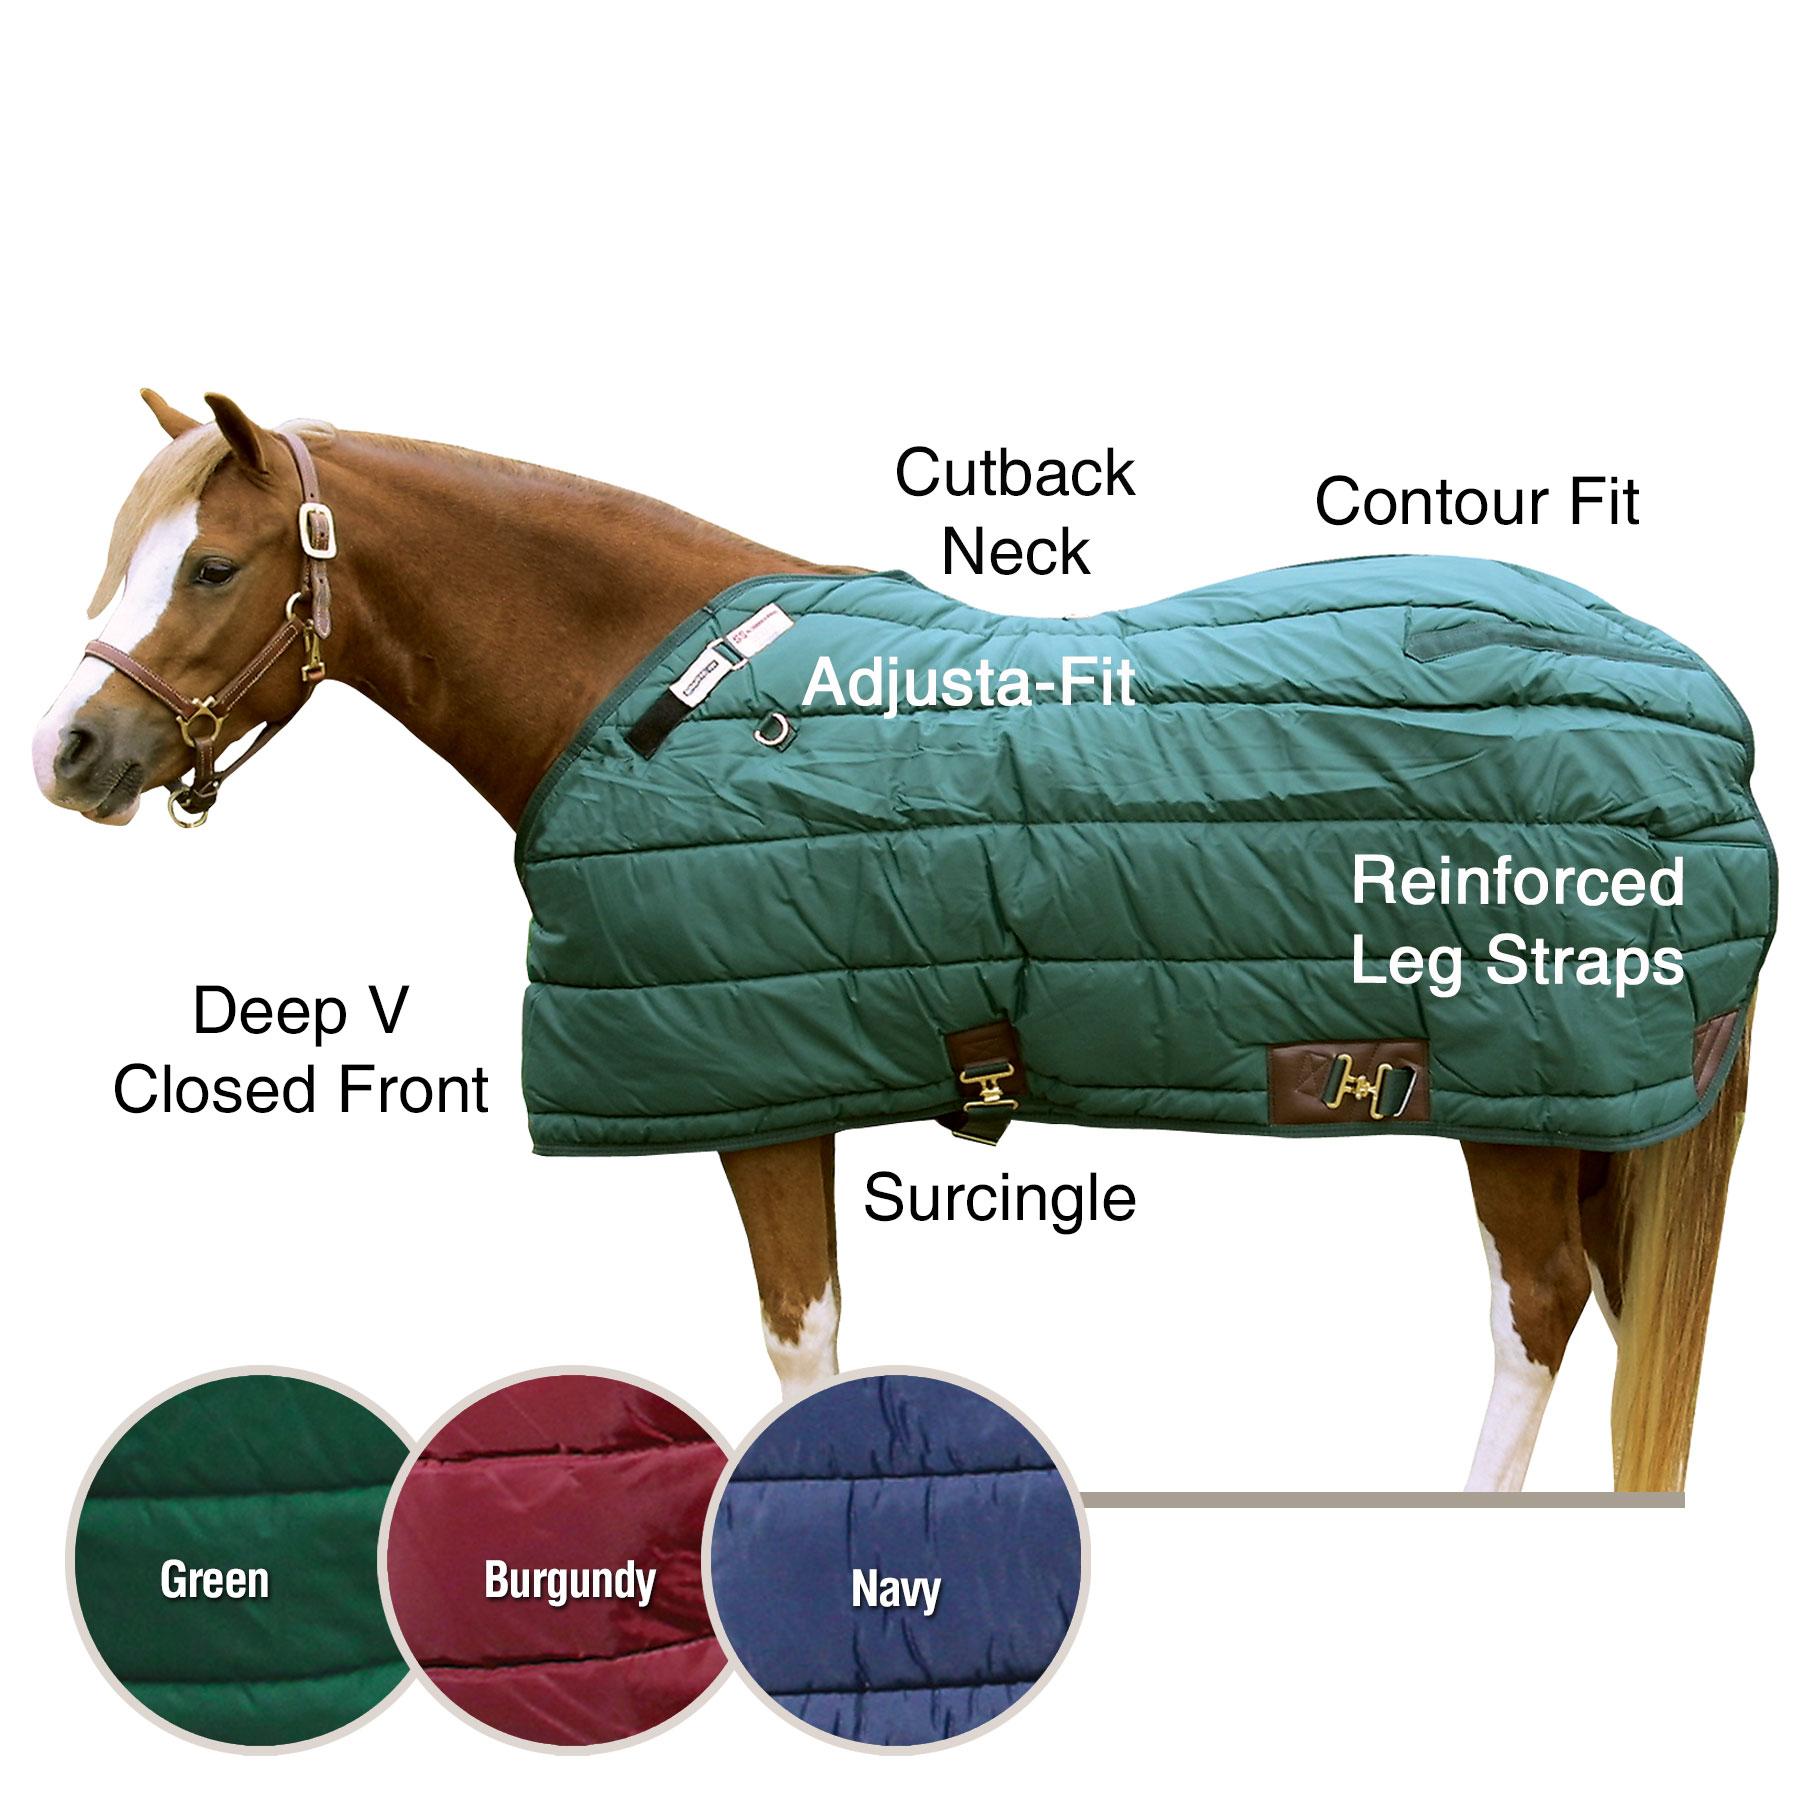 ai13183 Adjusta-Fit® Pony Leg Strap Midweight Stable Blanket